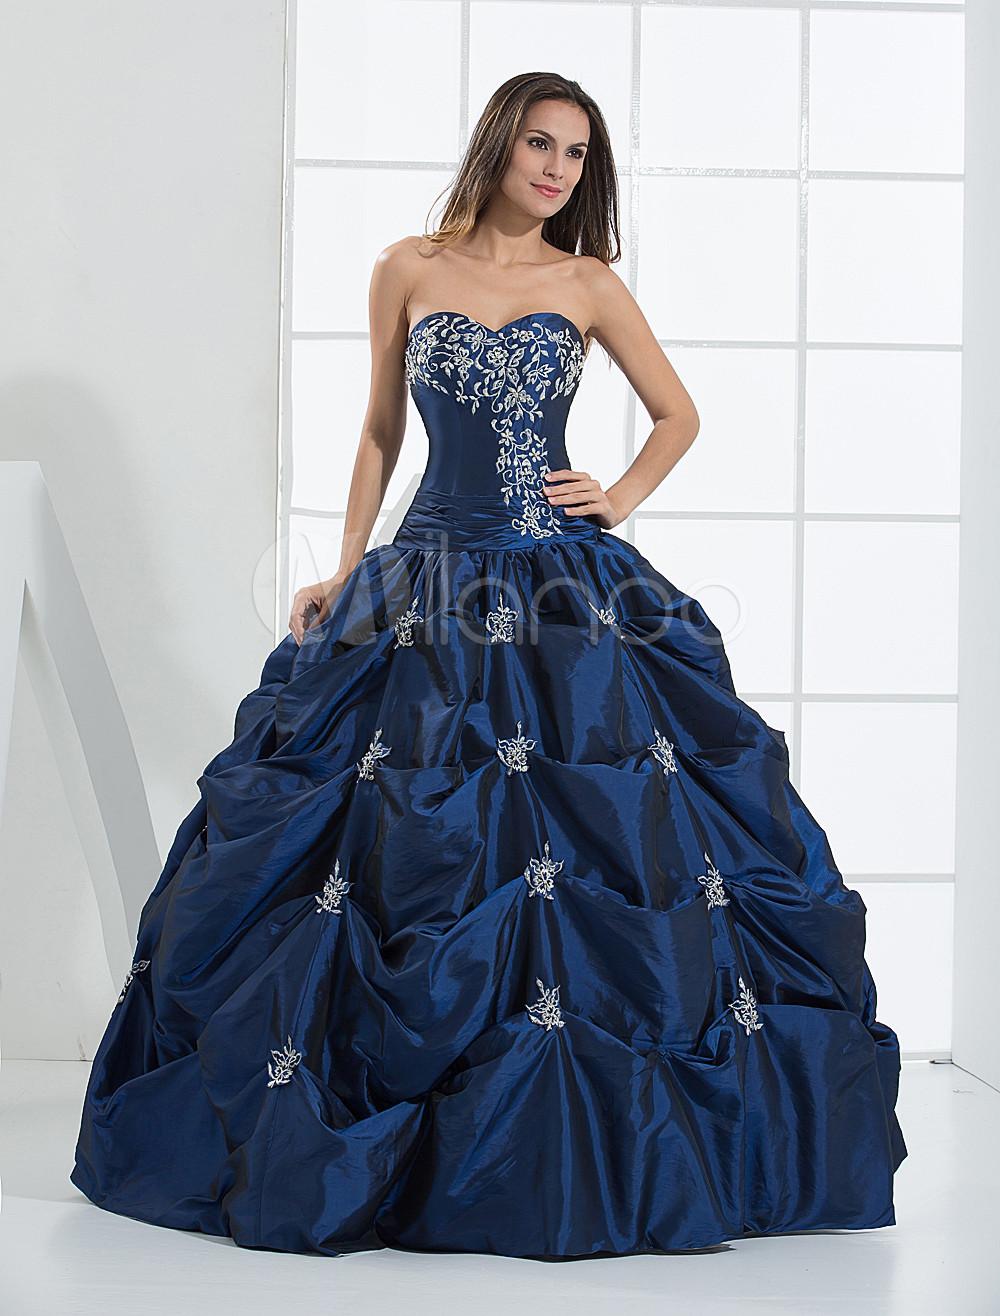 Blue Wedding Dress Satin Beading Vintage Strapless Sweetheart Floor-Length Bridal Gown photo